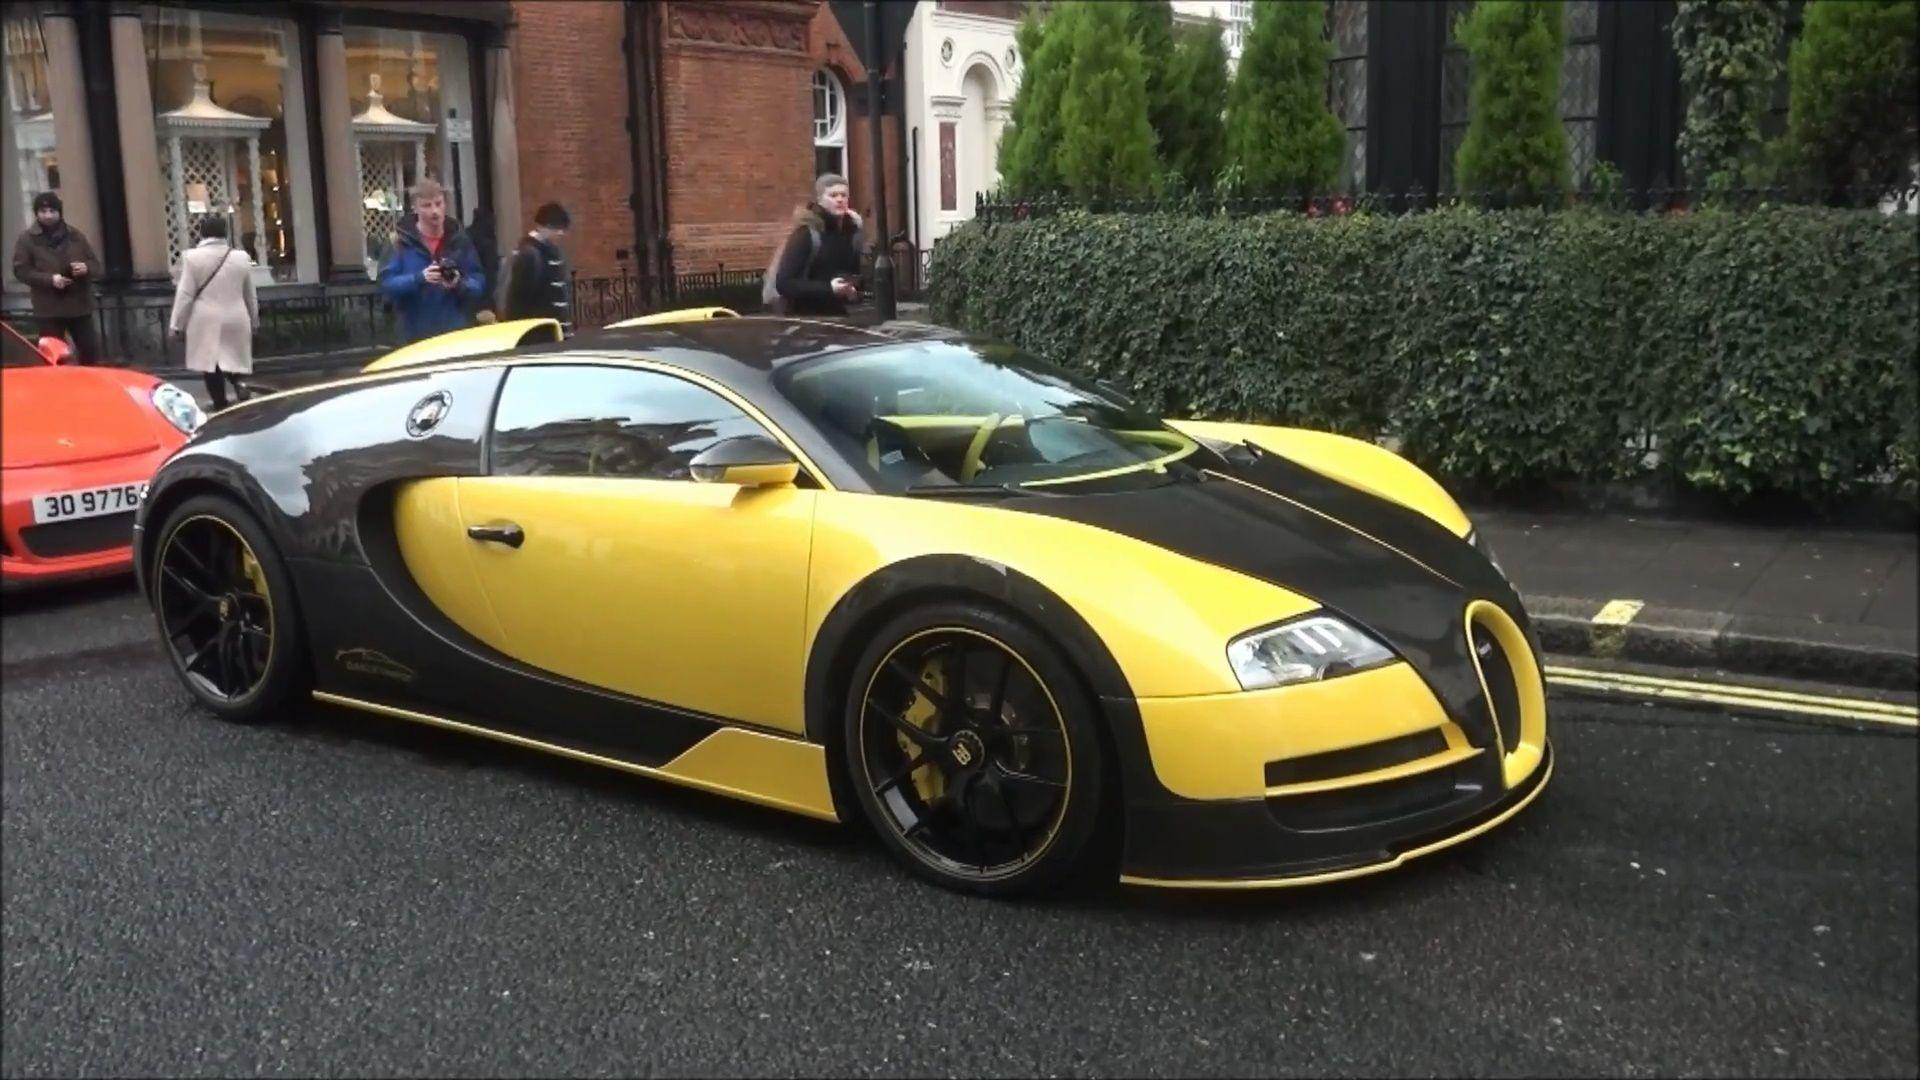 Oakley Design Bugatti Veyron Spotted In London Side Angle 2 Sssupersports Com Bugatti Veyron Bugatti Veyron